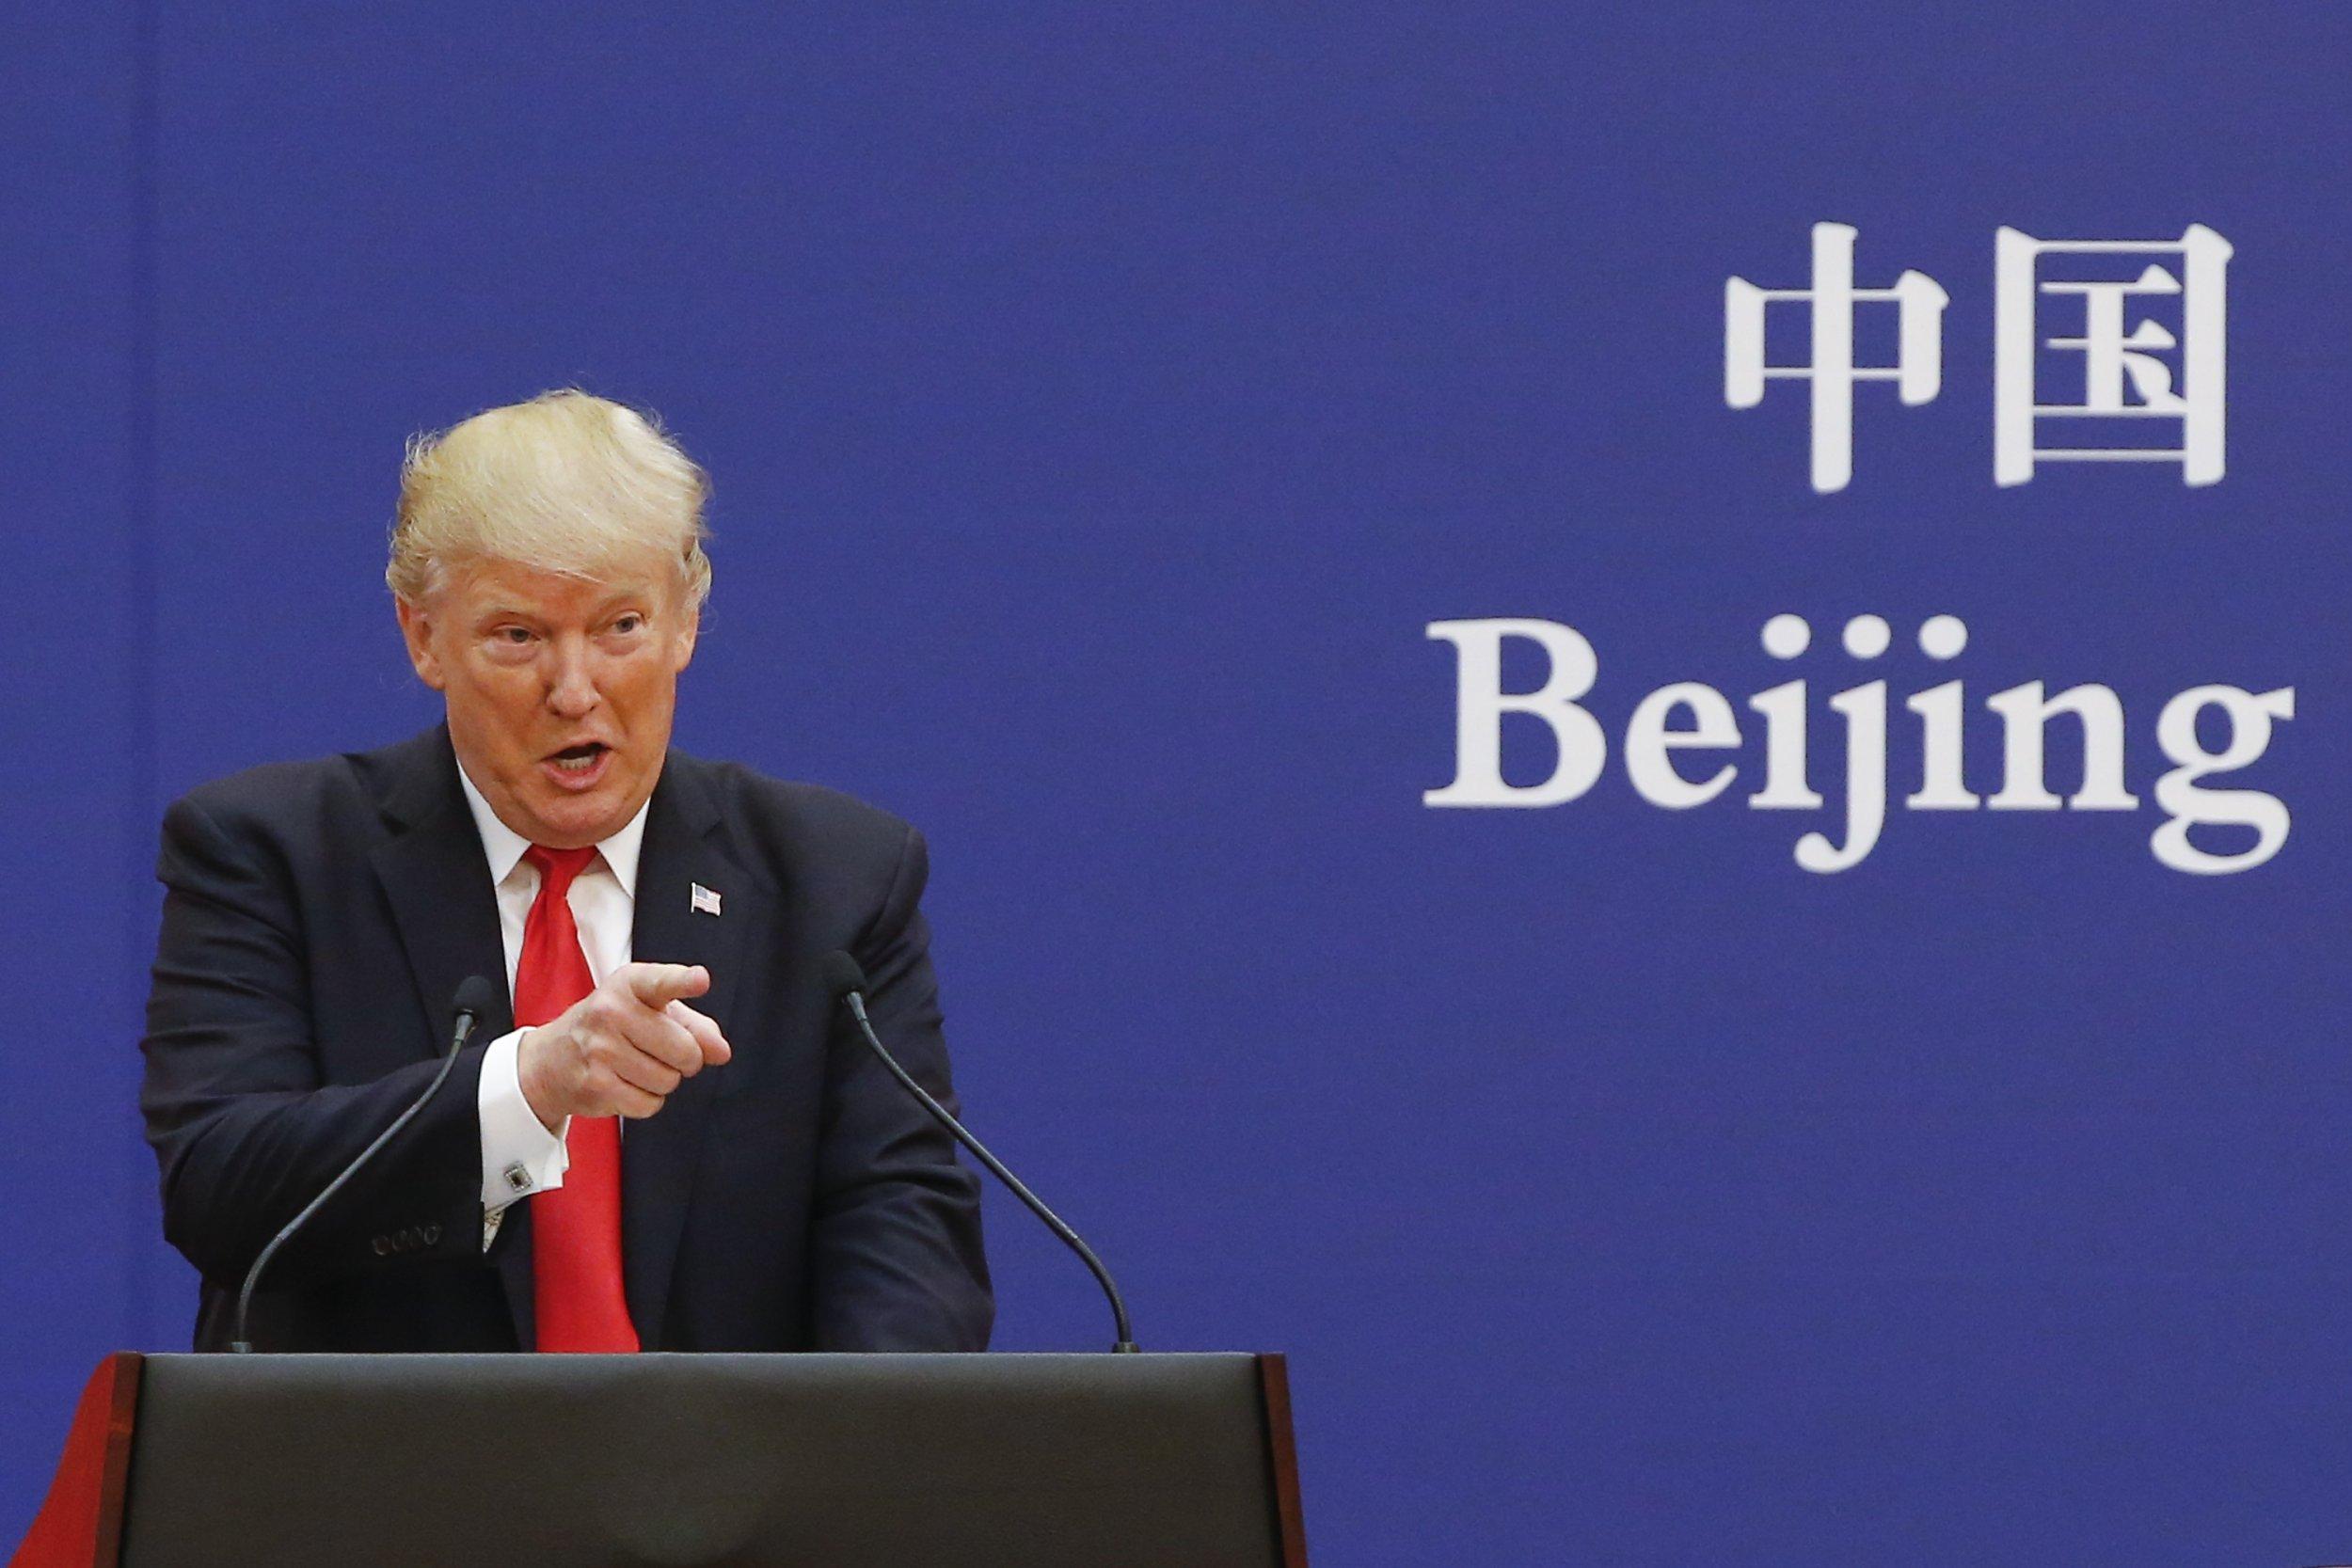 12_28_Donald_Trump_China_North_Korea_oil